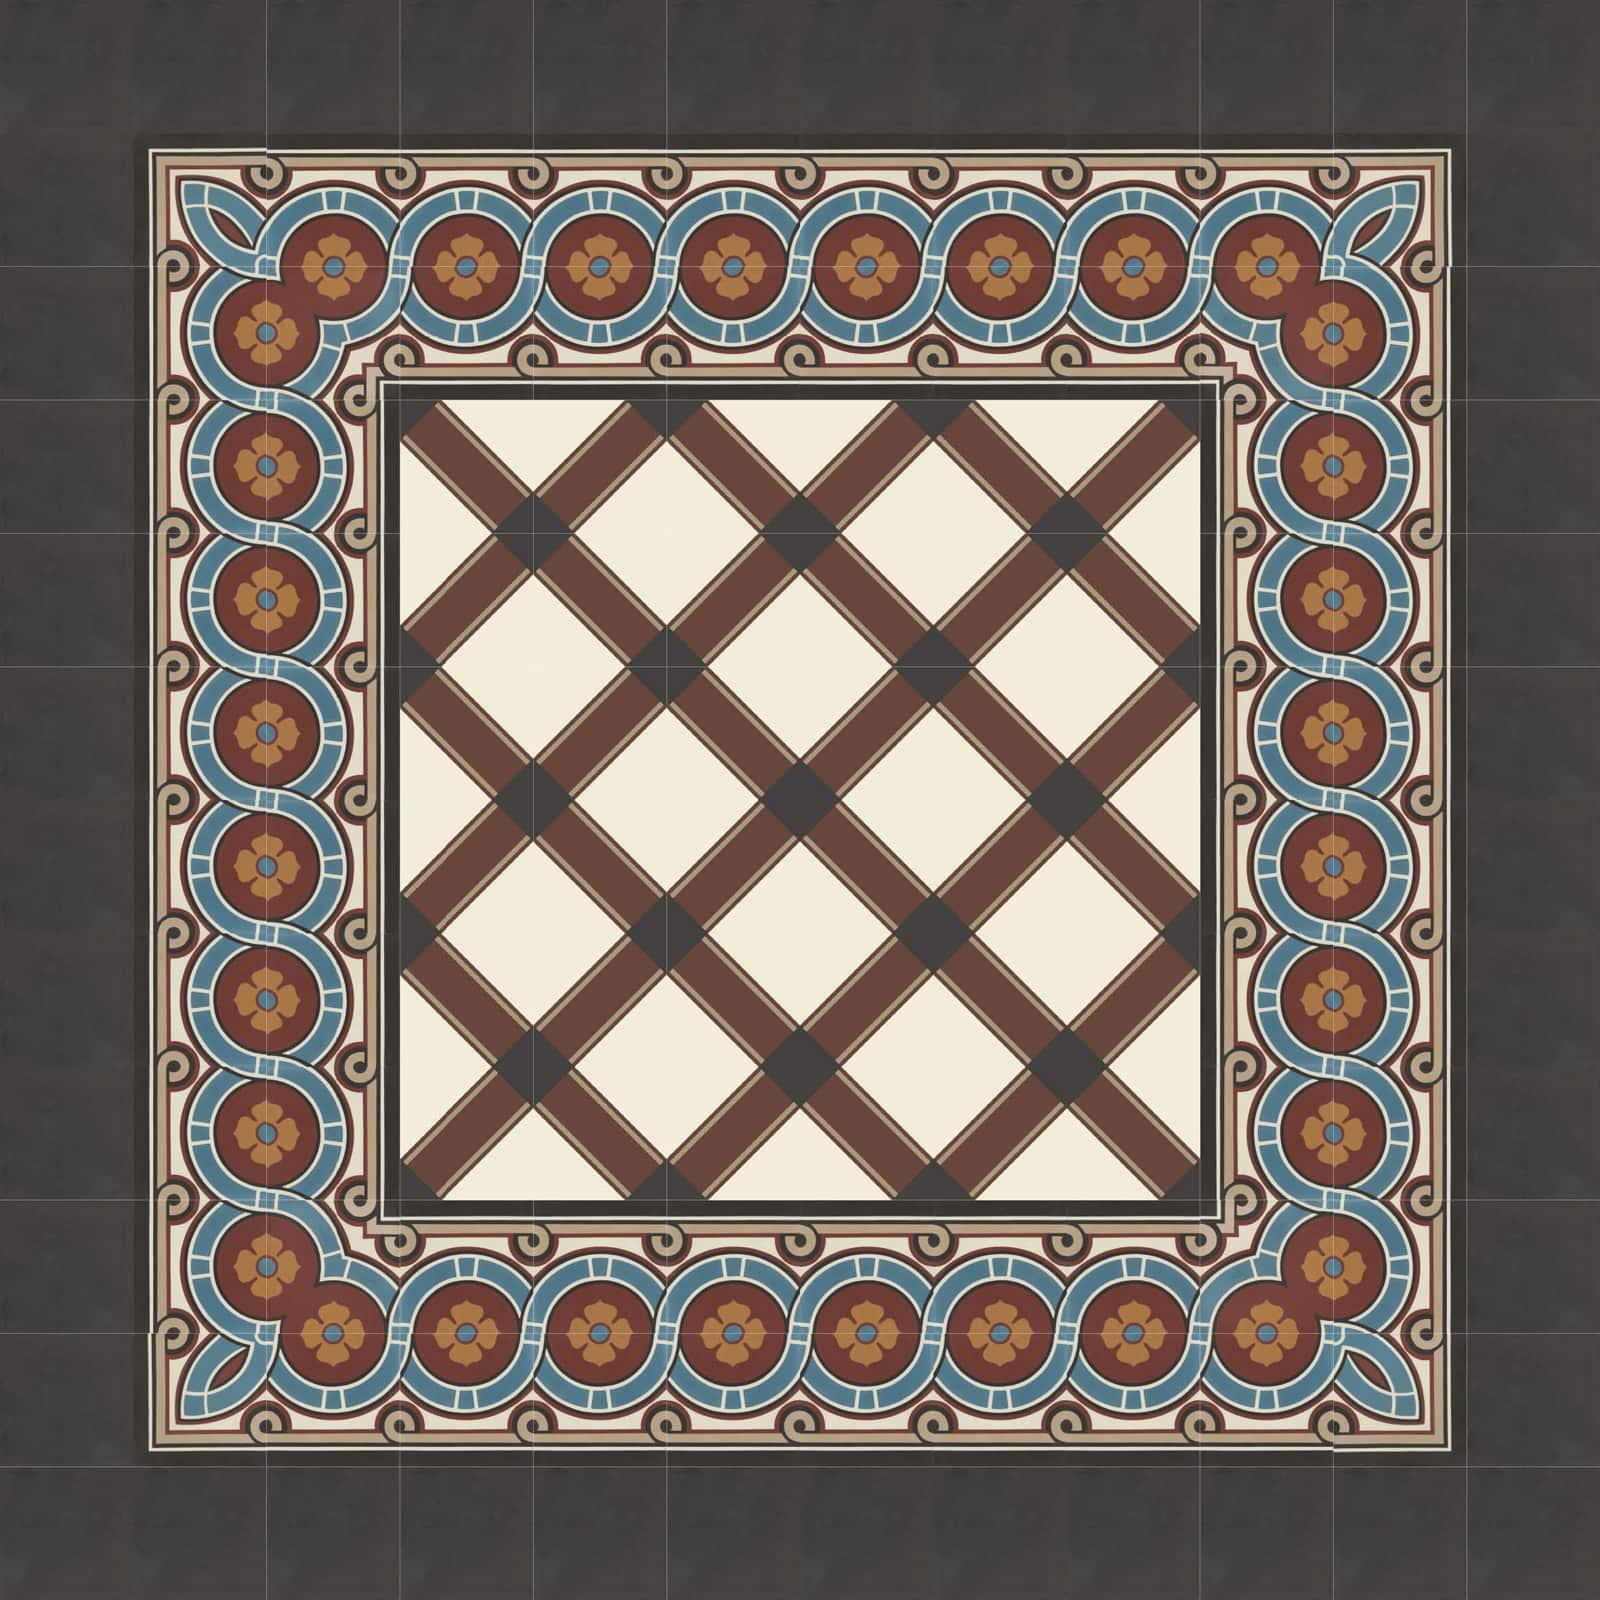 zementfliesen-verlegemuster-nummer-51167-viaplatten | N° 51166/170